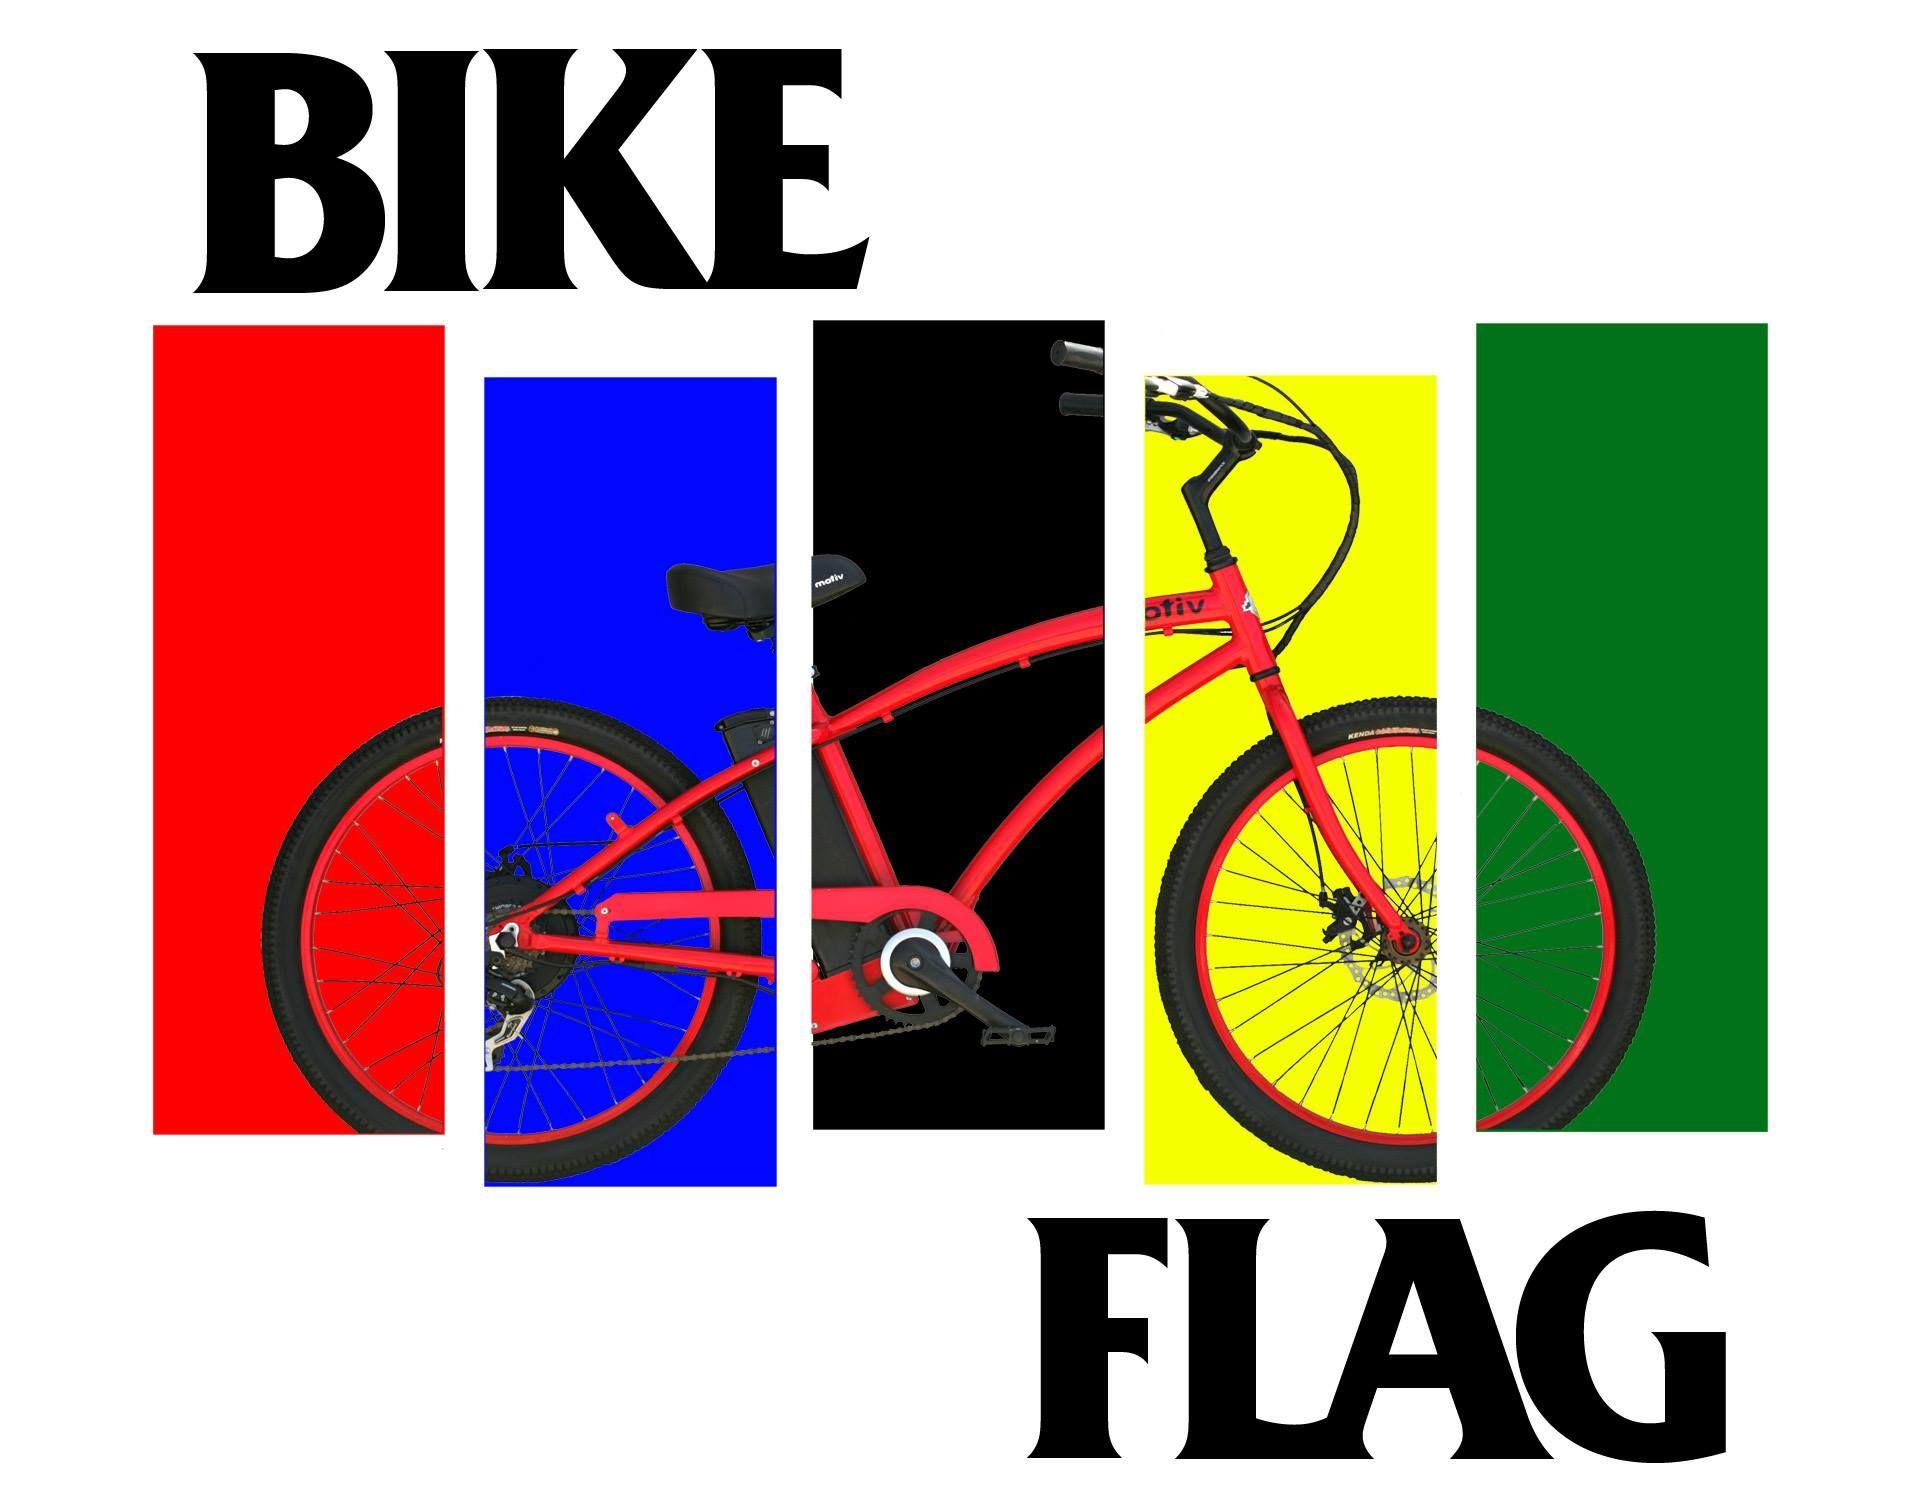 Motiv Electric Bike Standard Bike Electric Bike Flag